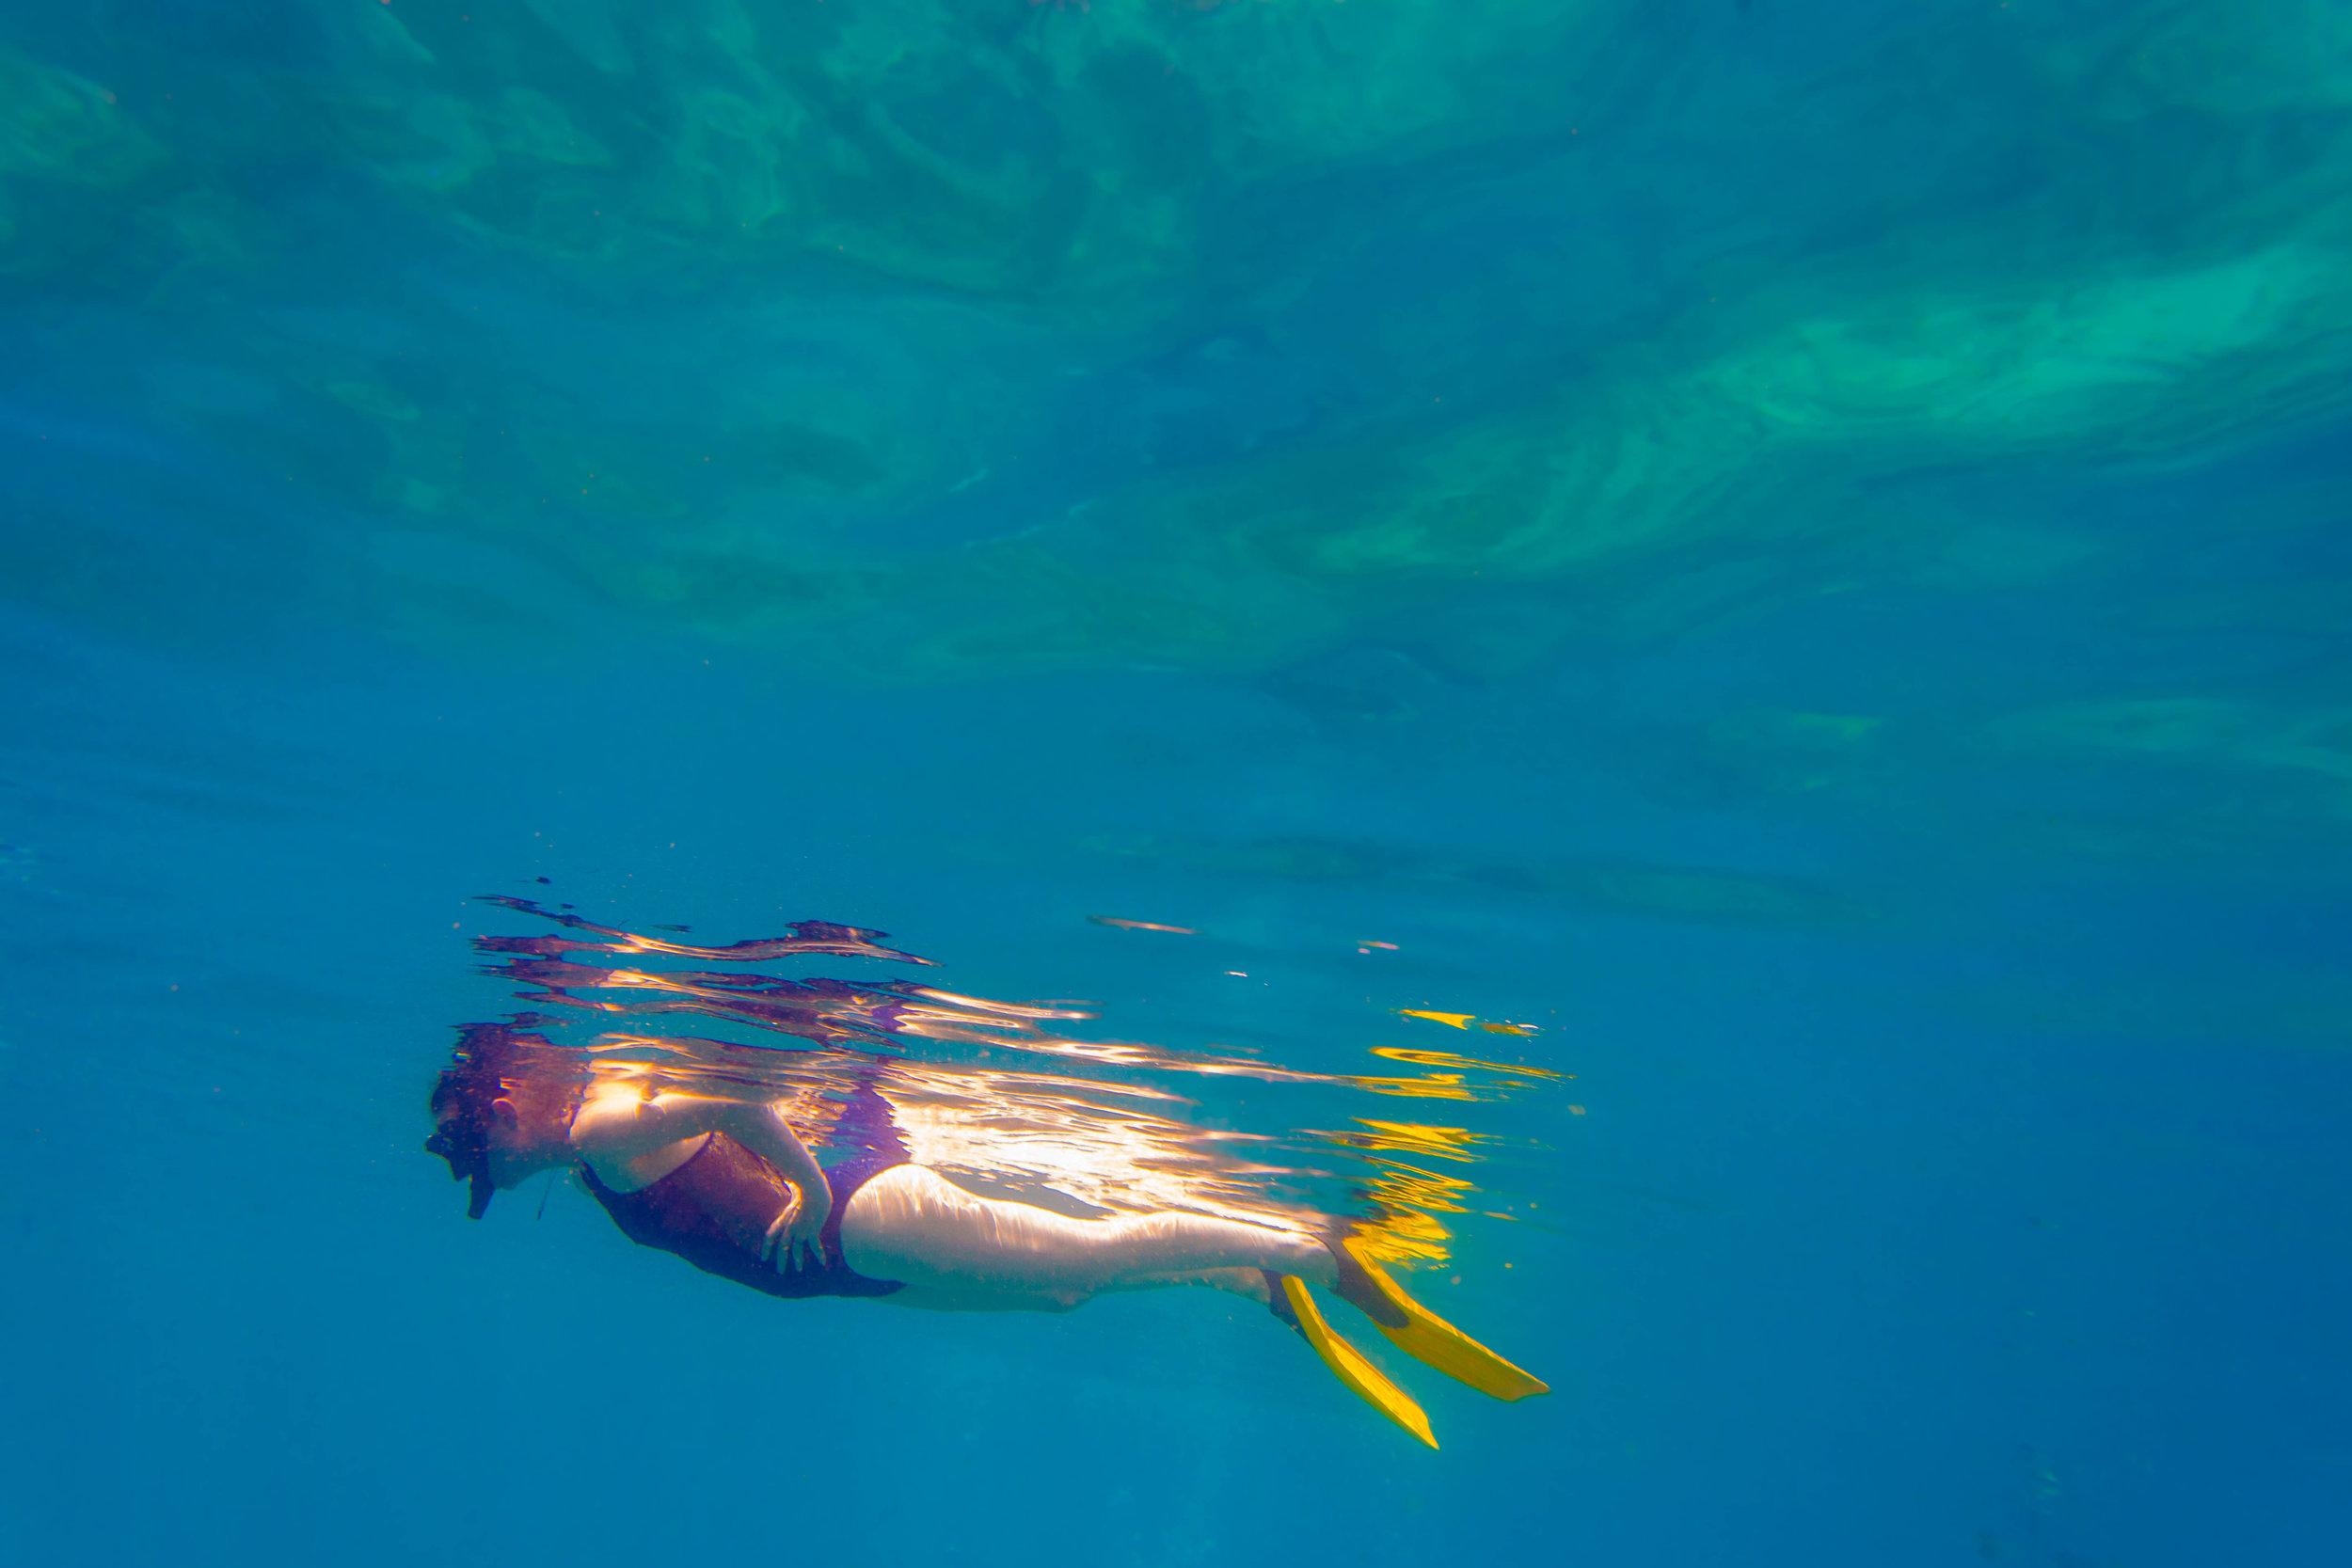 Anglers-Hotel-Reef-ve_steve-boxall-20180614_0023-Edit.jpg